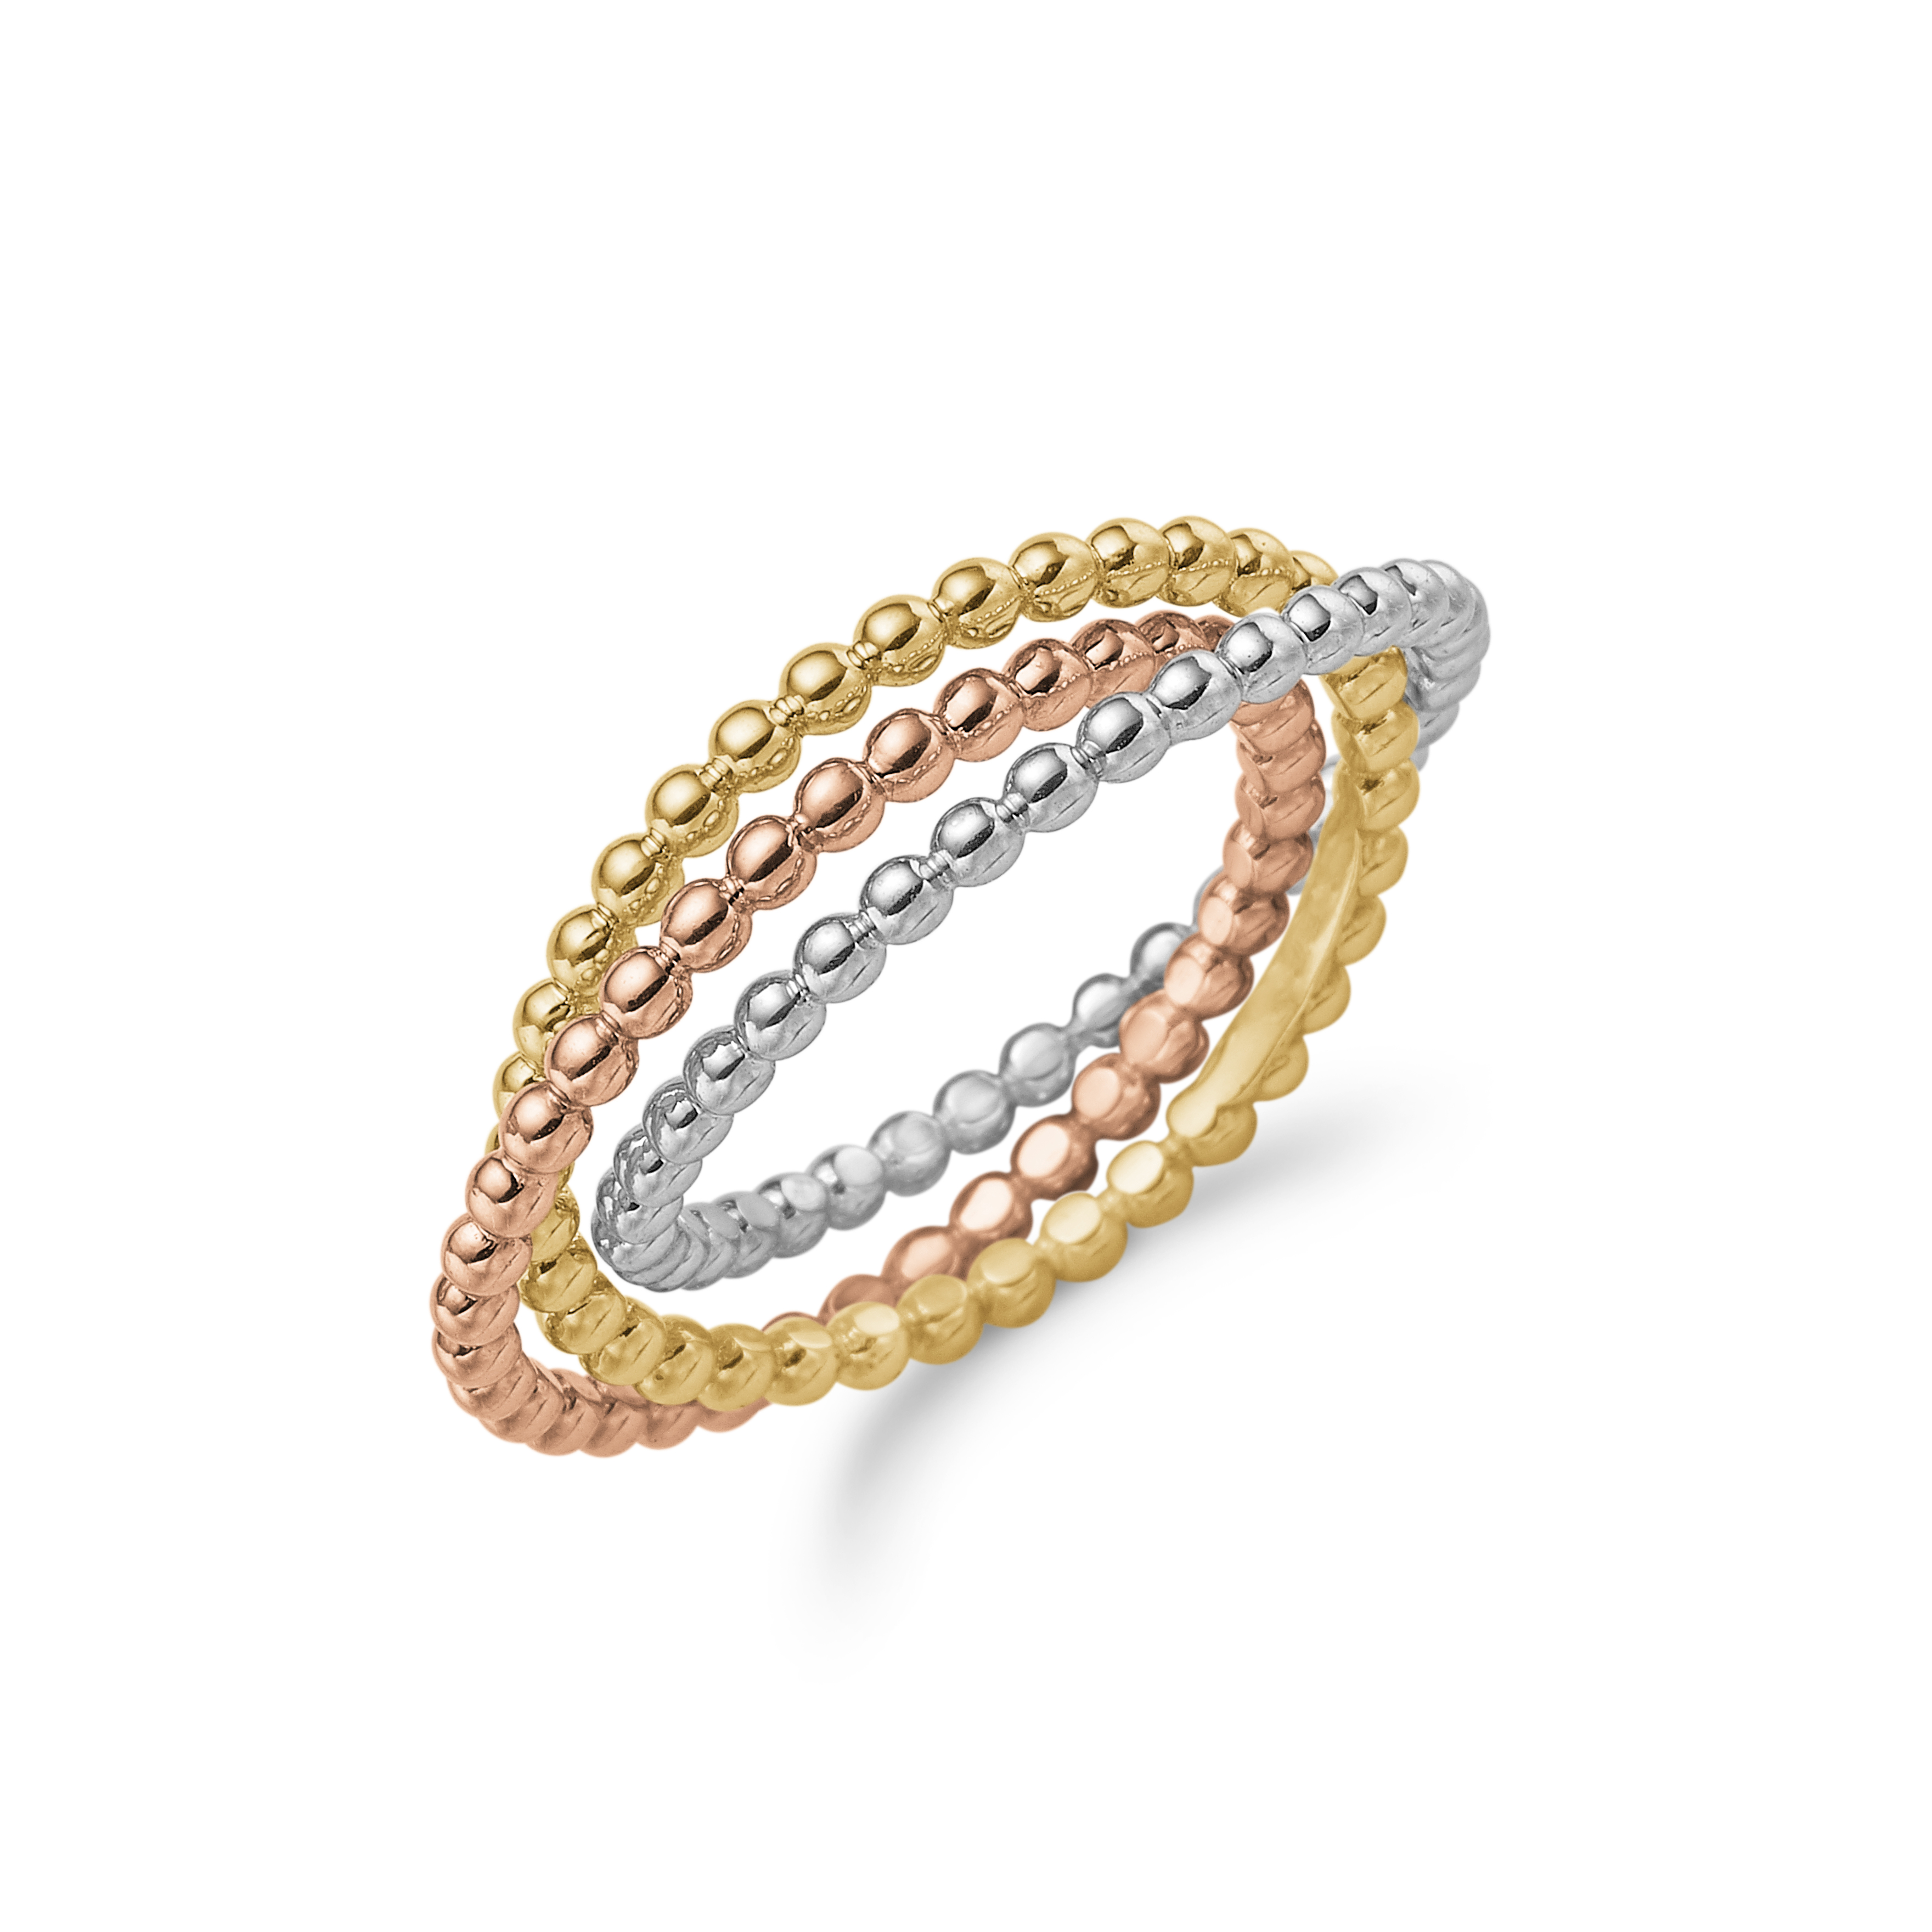 Aagaard 8 kt ring - 08612153 Størrelse 54